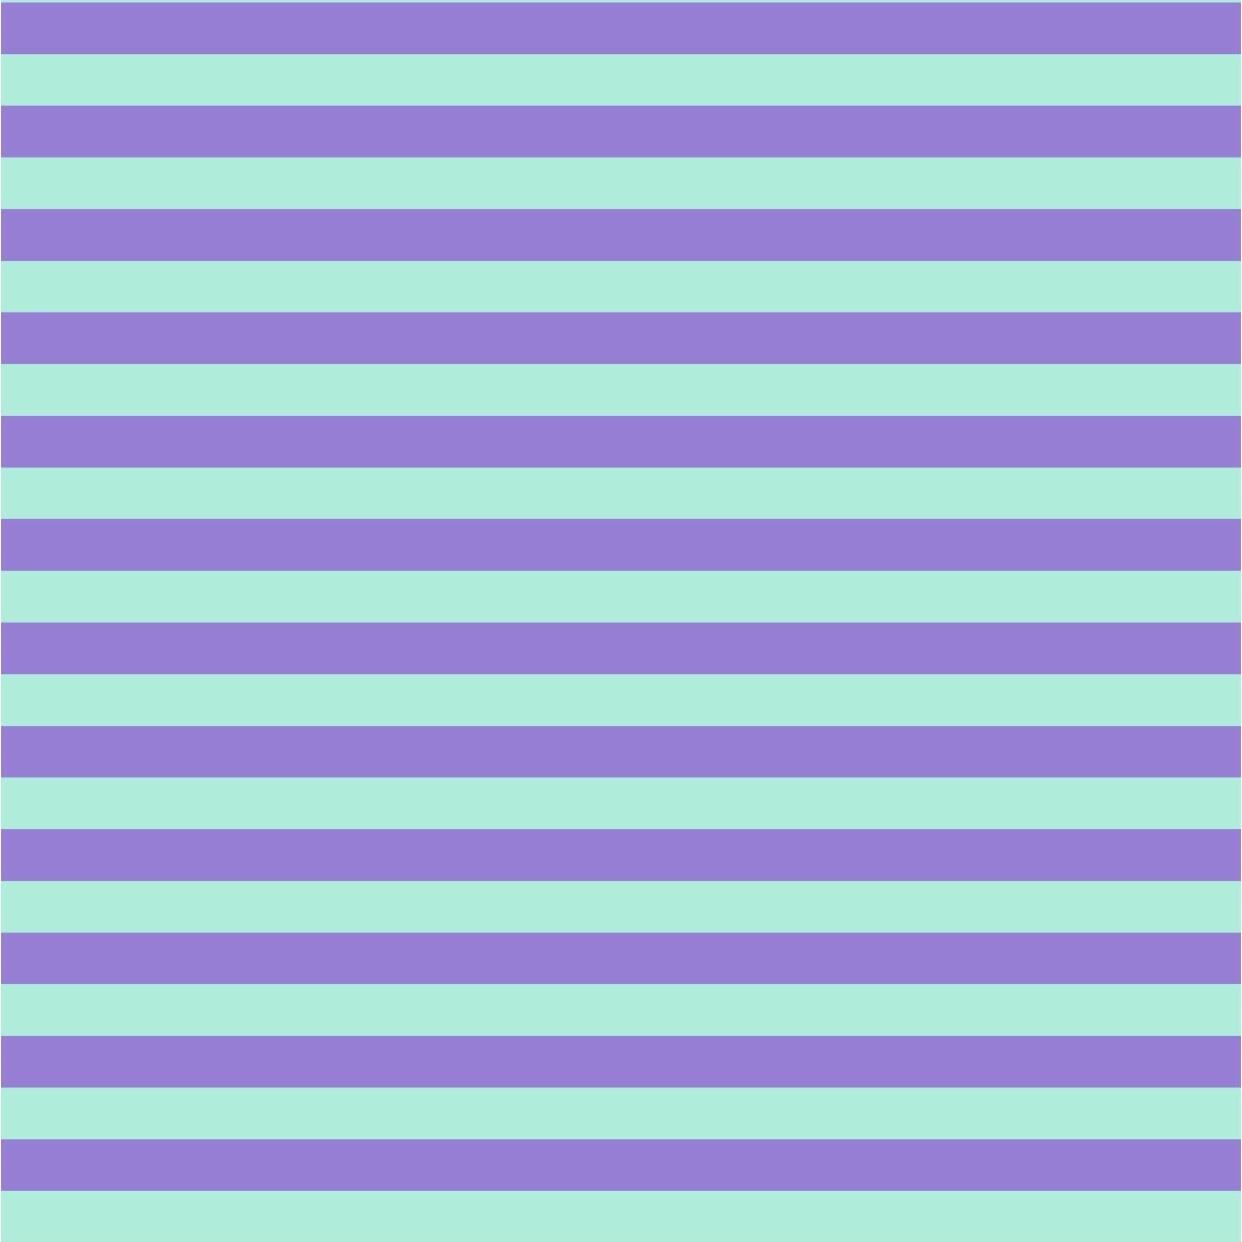 TULA PINK HOMEMADE Stripe, Petunia, per cm or $17/m